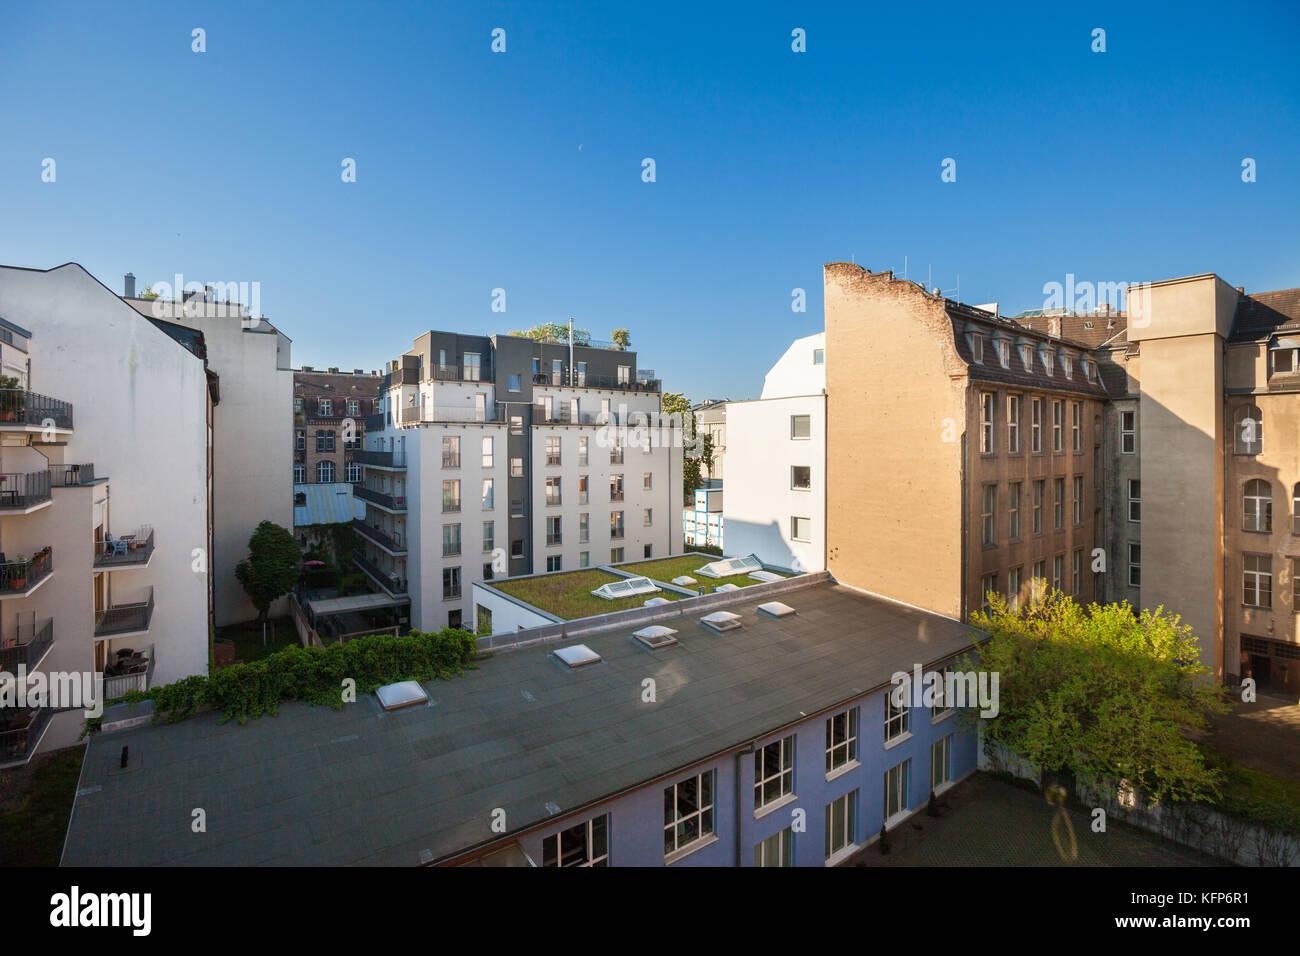 Housing estate in berlin in stock photos housing estate for Apartments near mercedes benz stadium